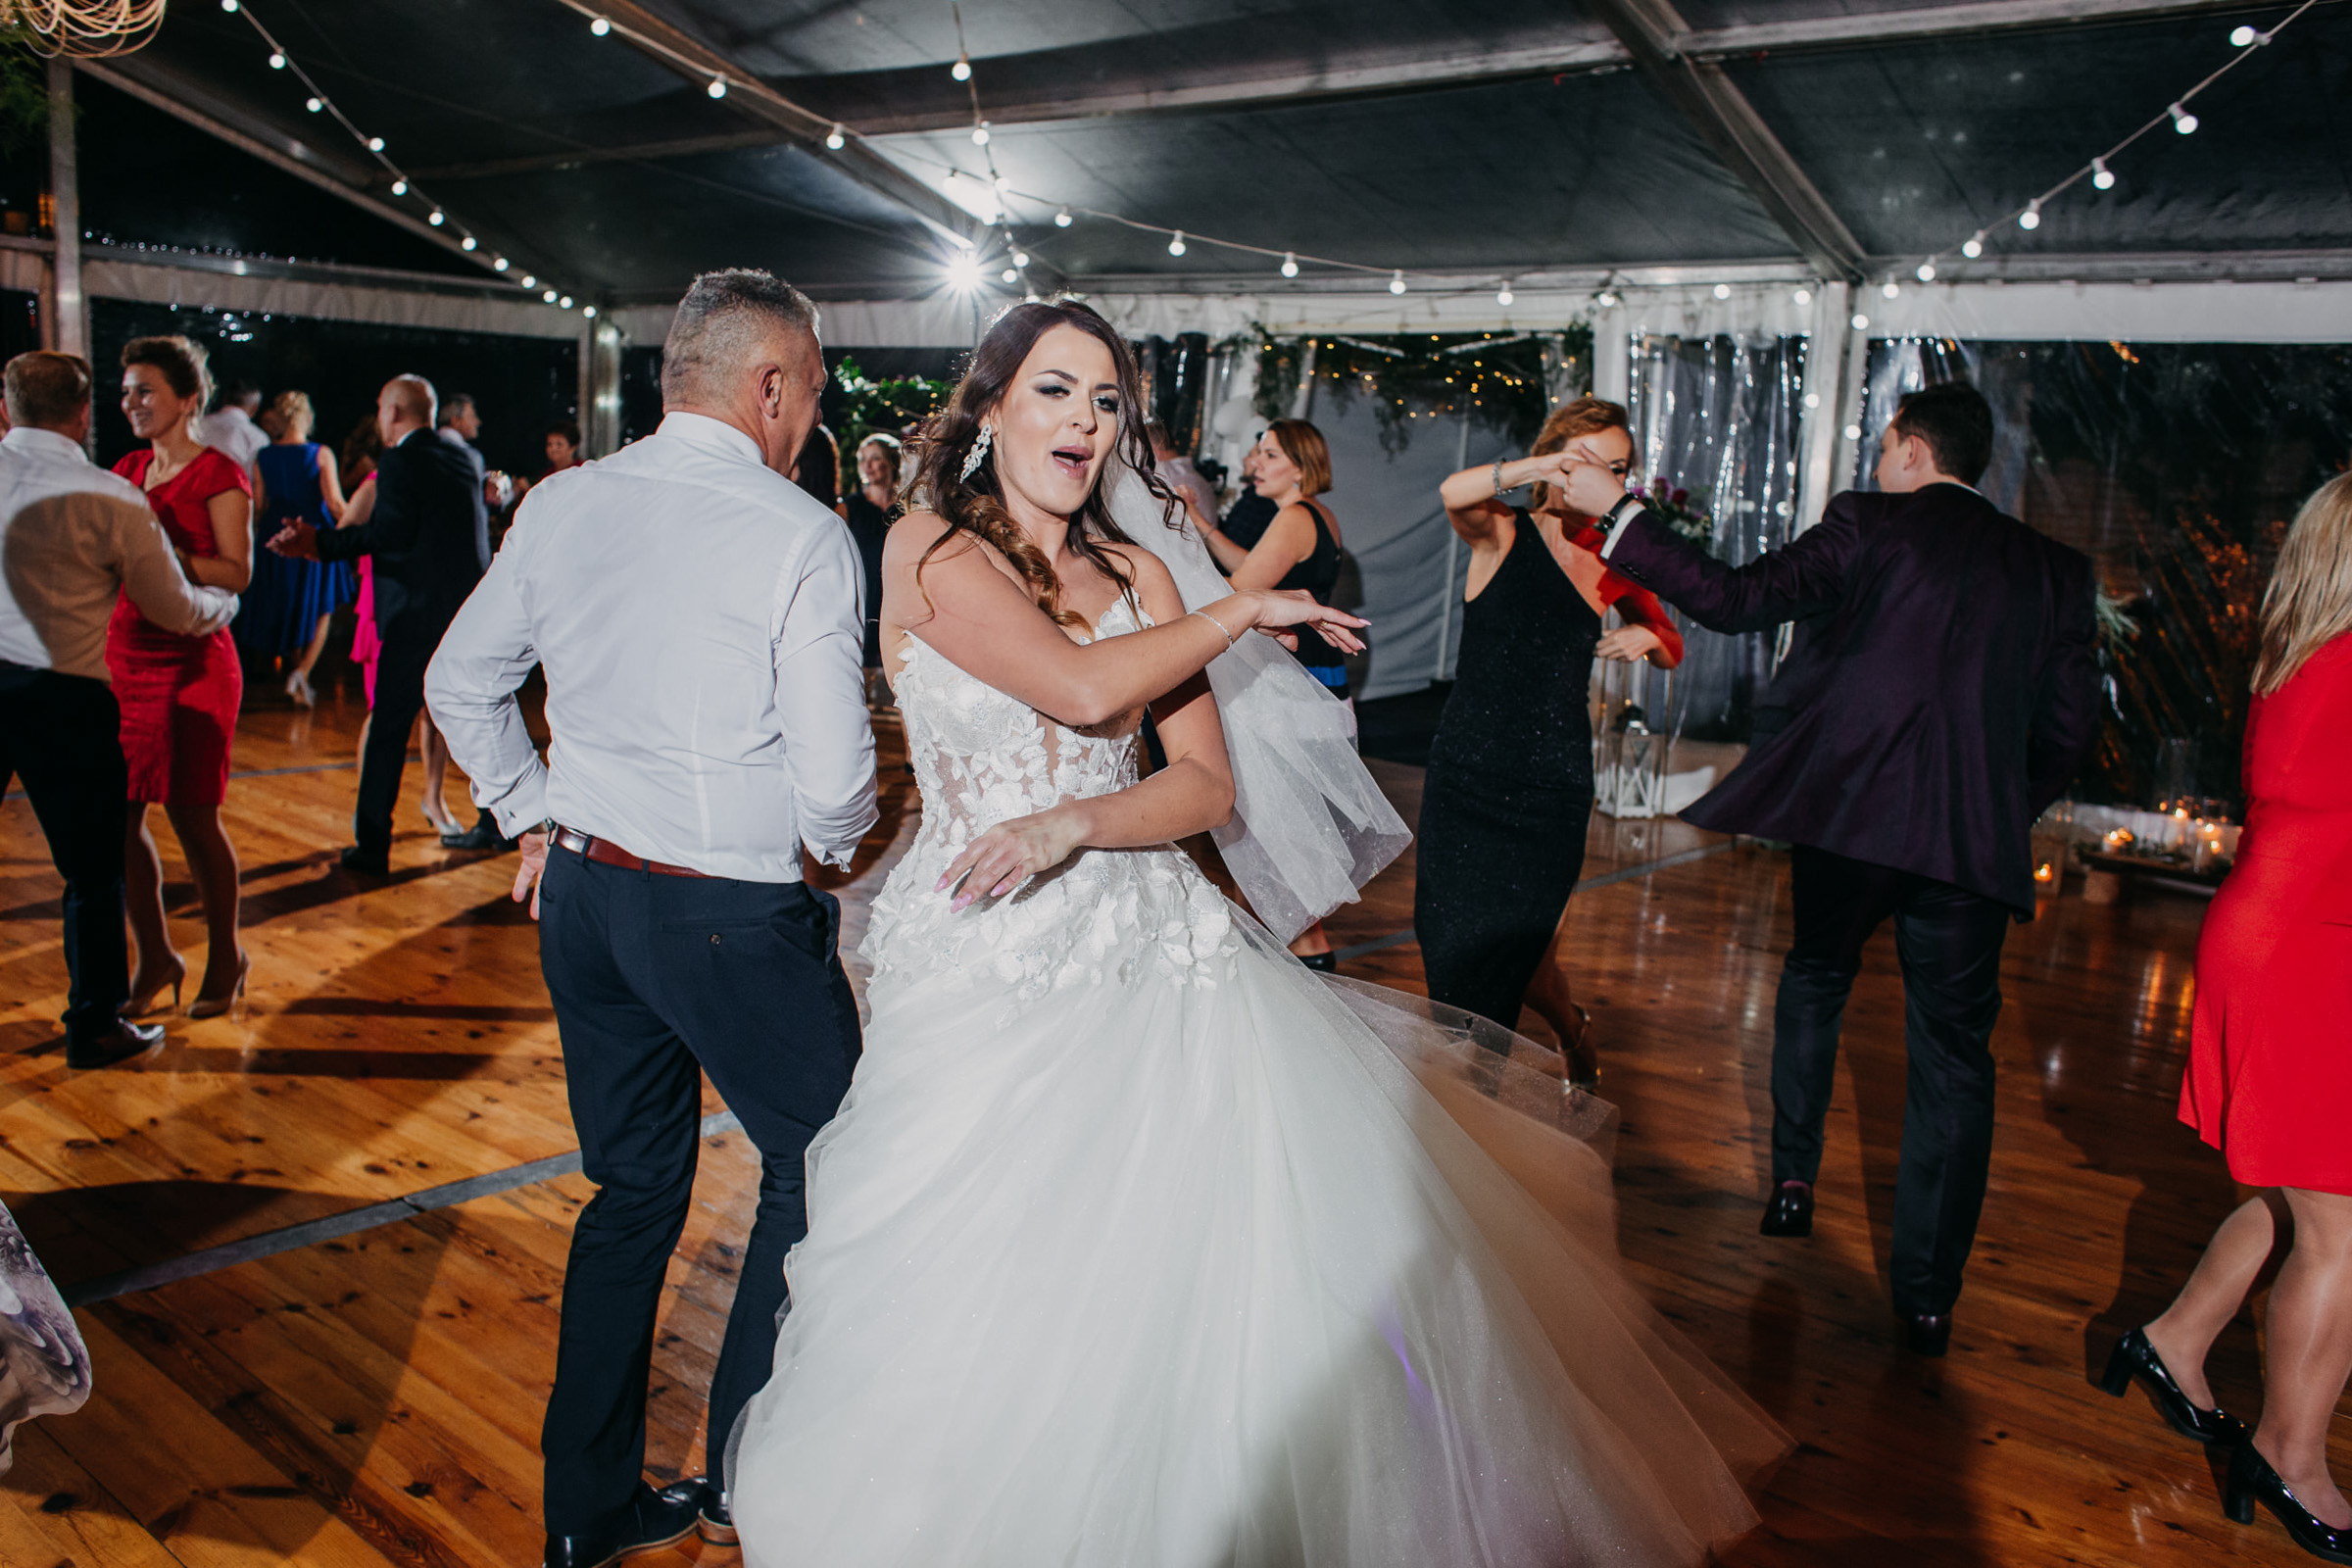 taniec panna młoda wesele